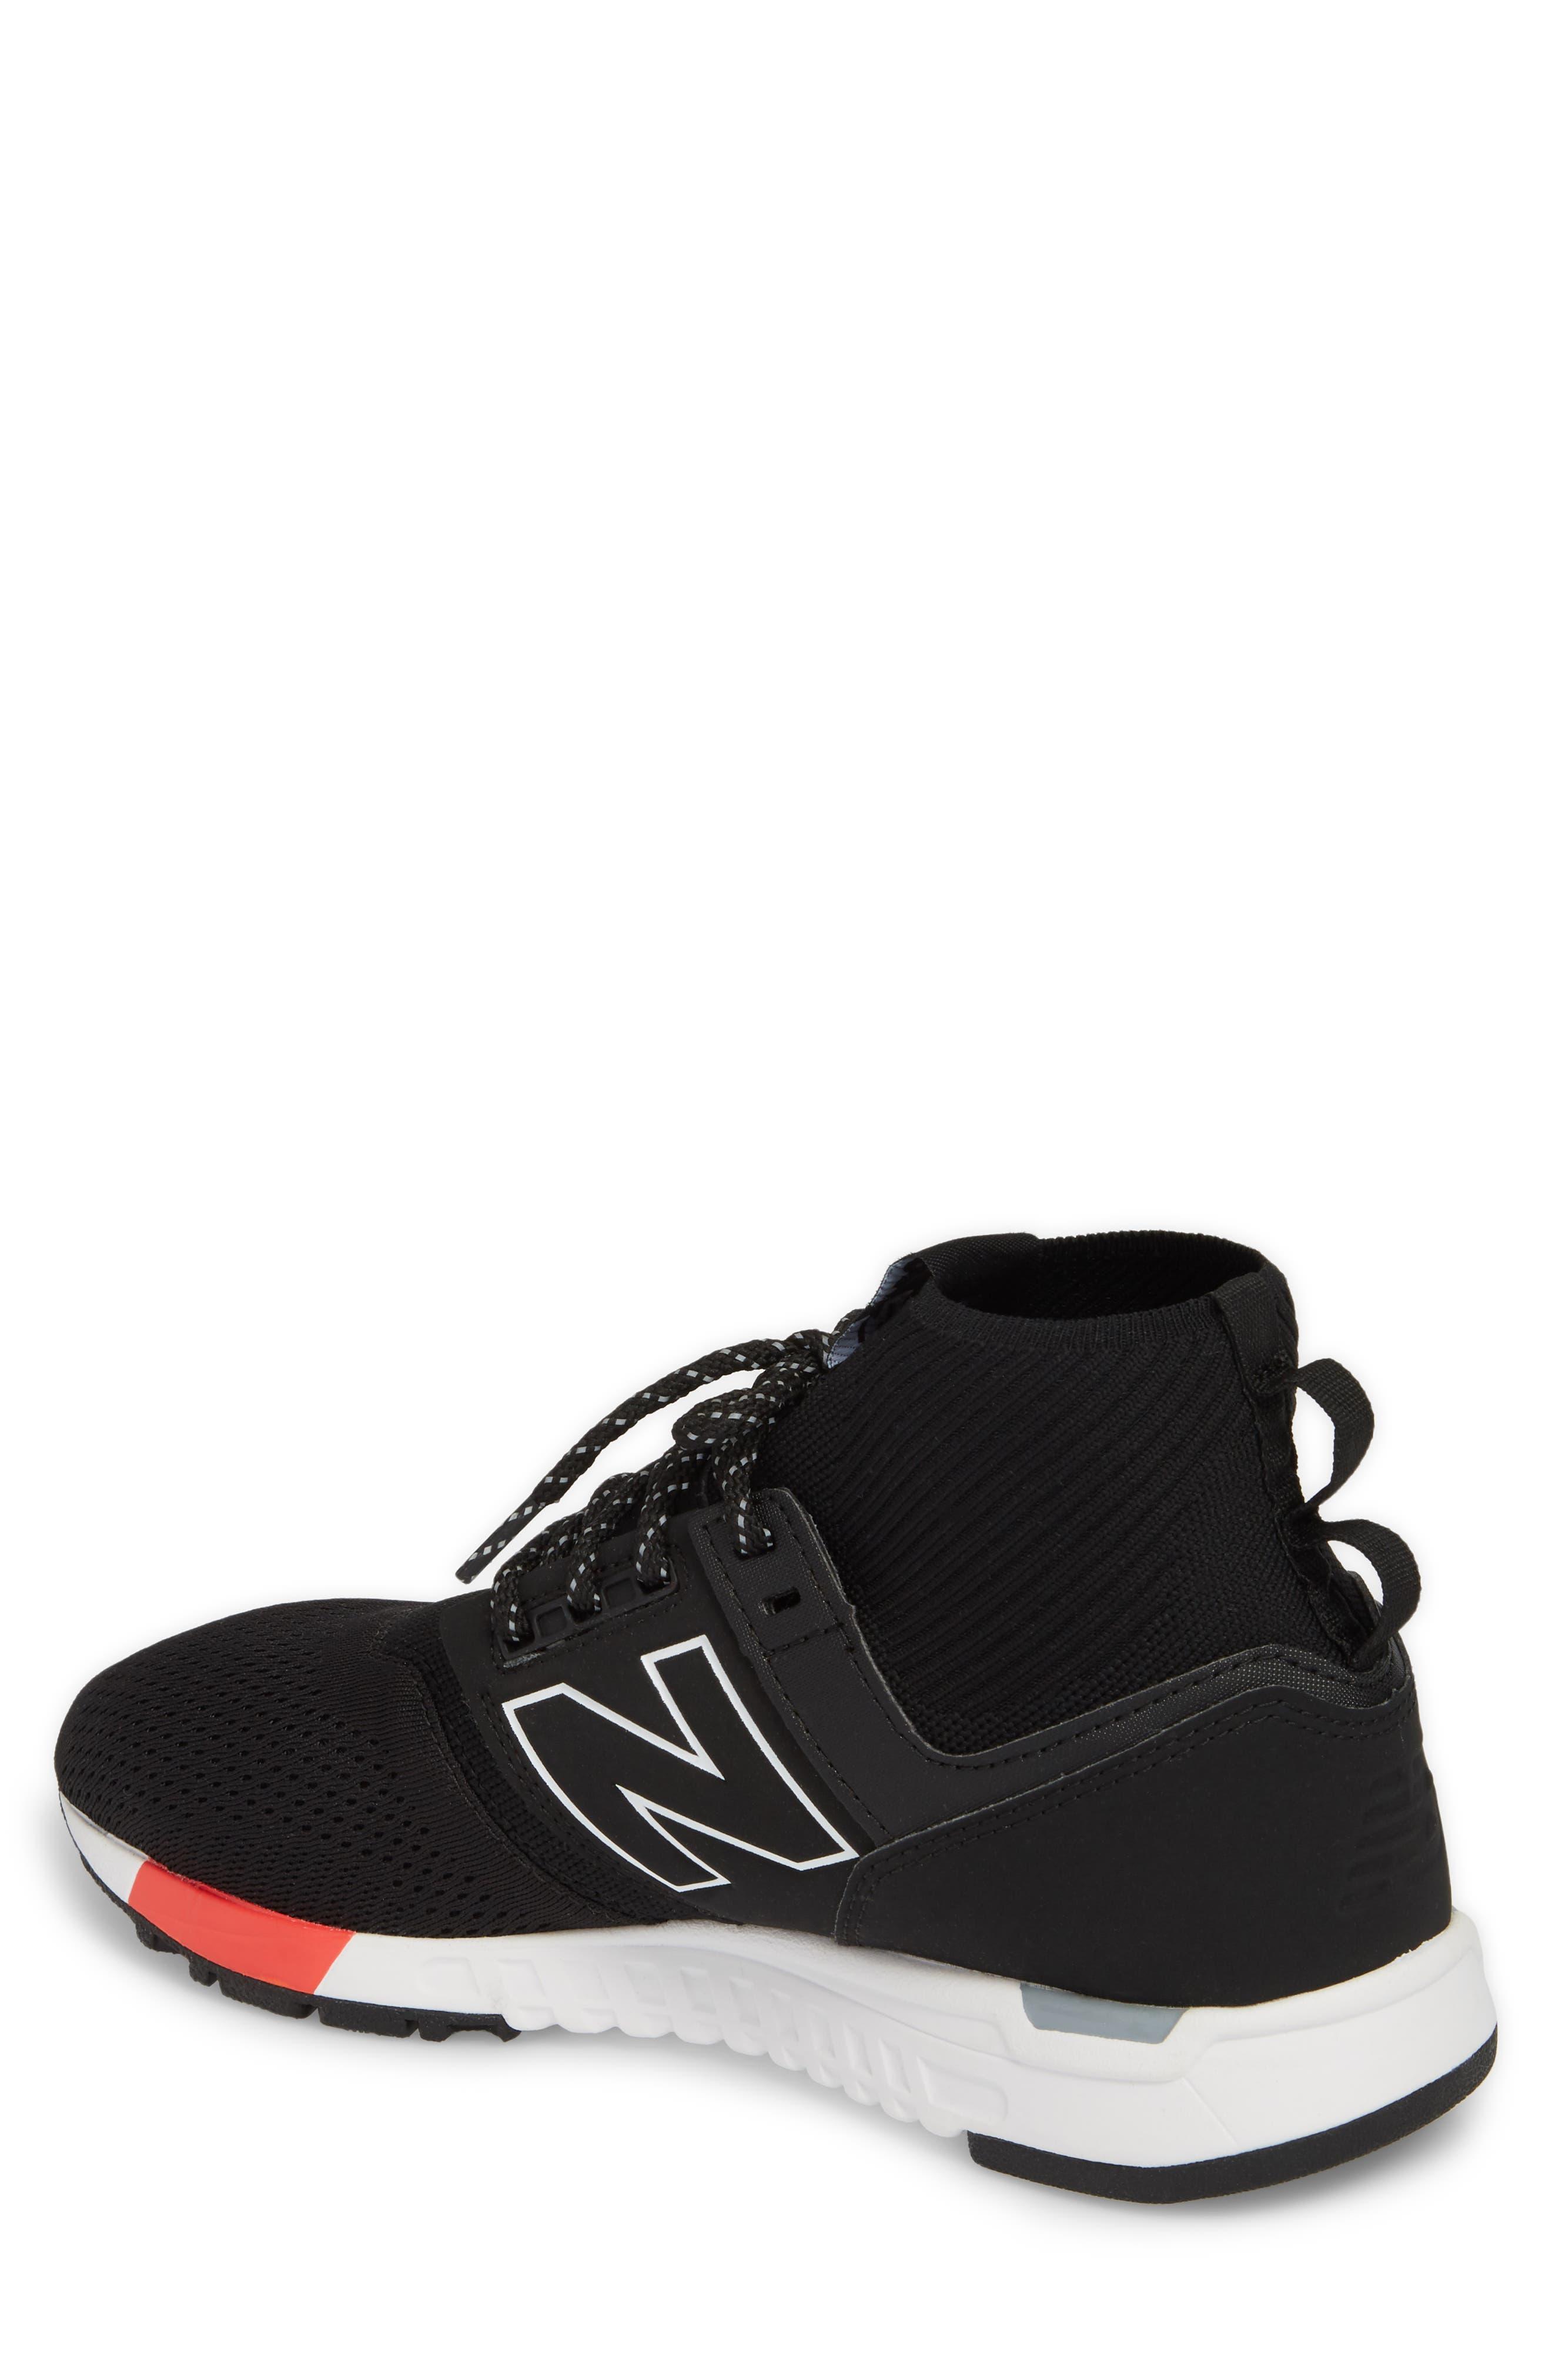 247 Mid Sneaker,                             Alternate thumbnail 2, color,                             Black